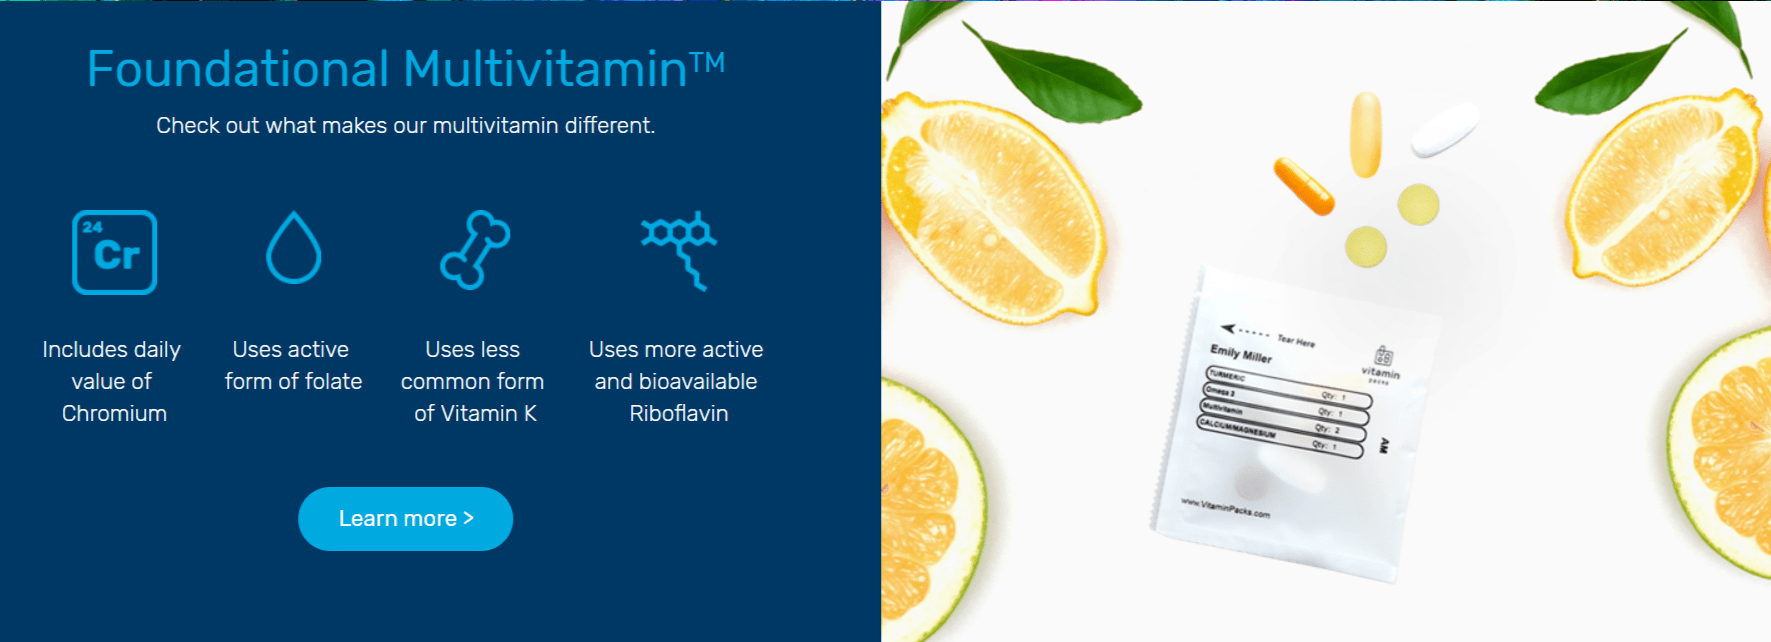 Vitamin Packs Coupon Code- Foundational Multivitamin